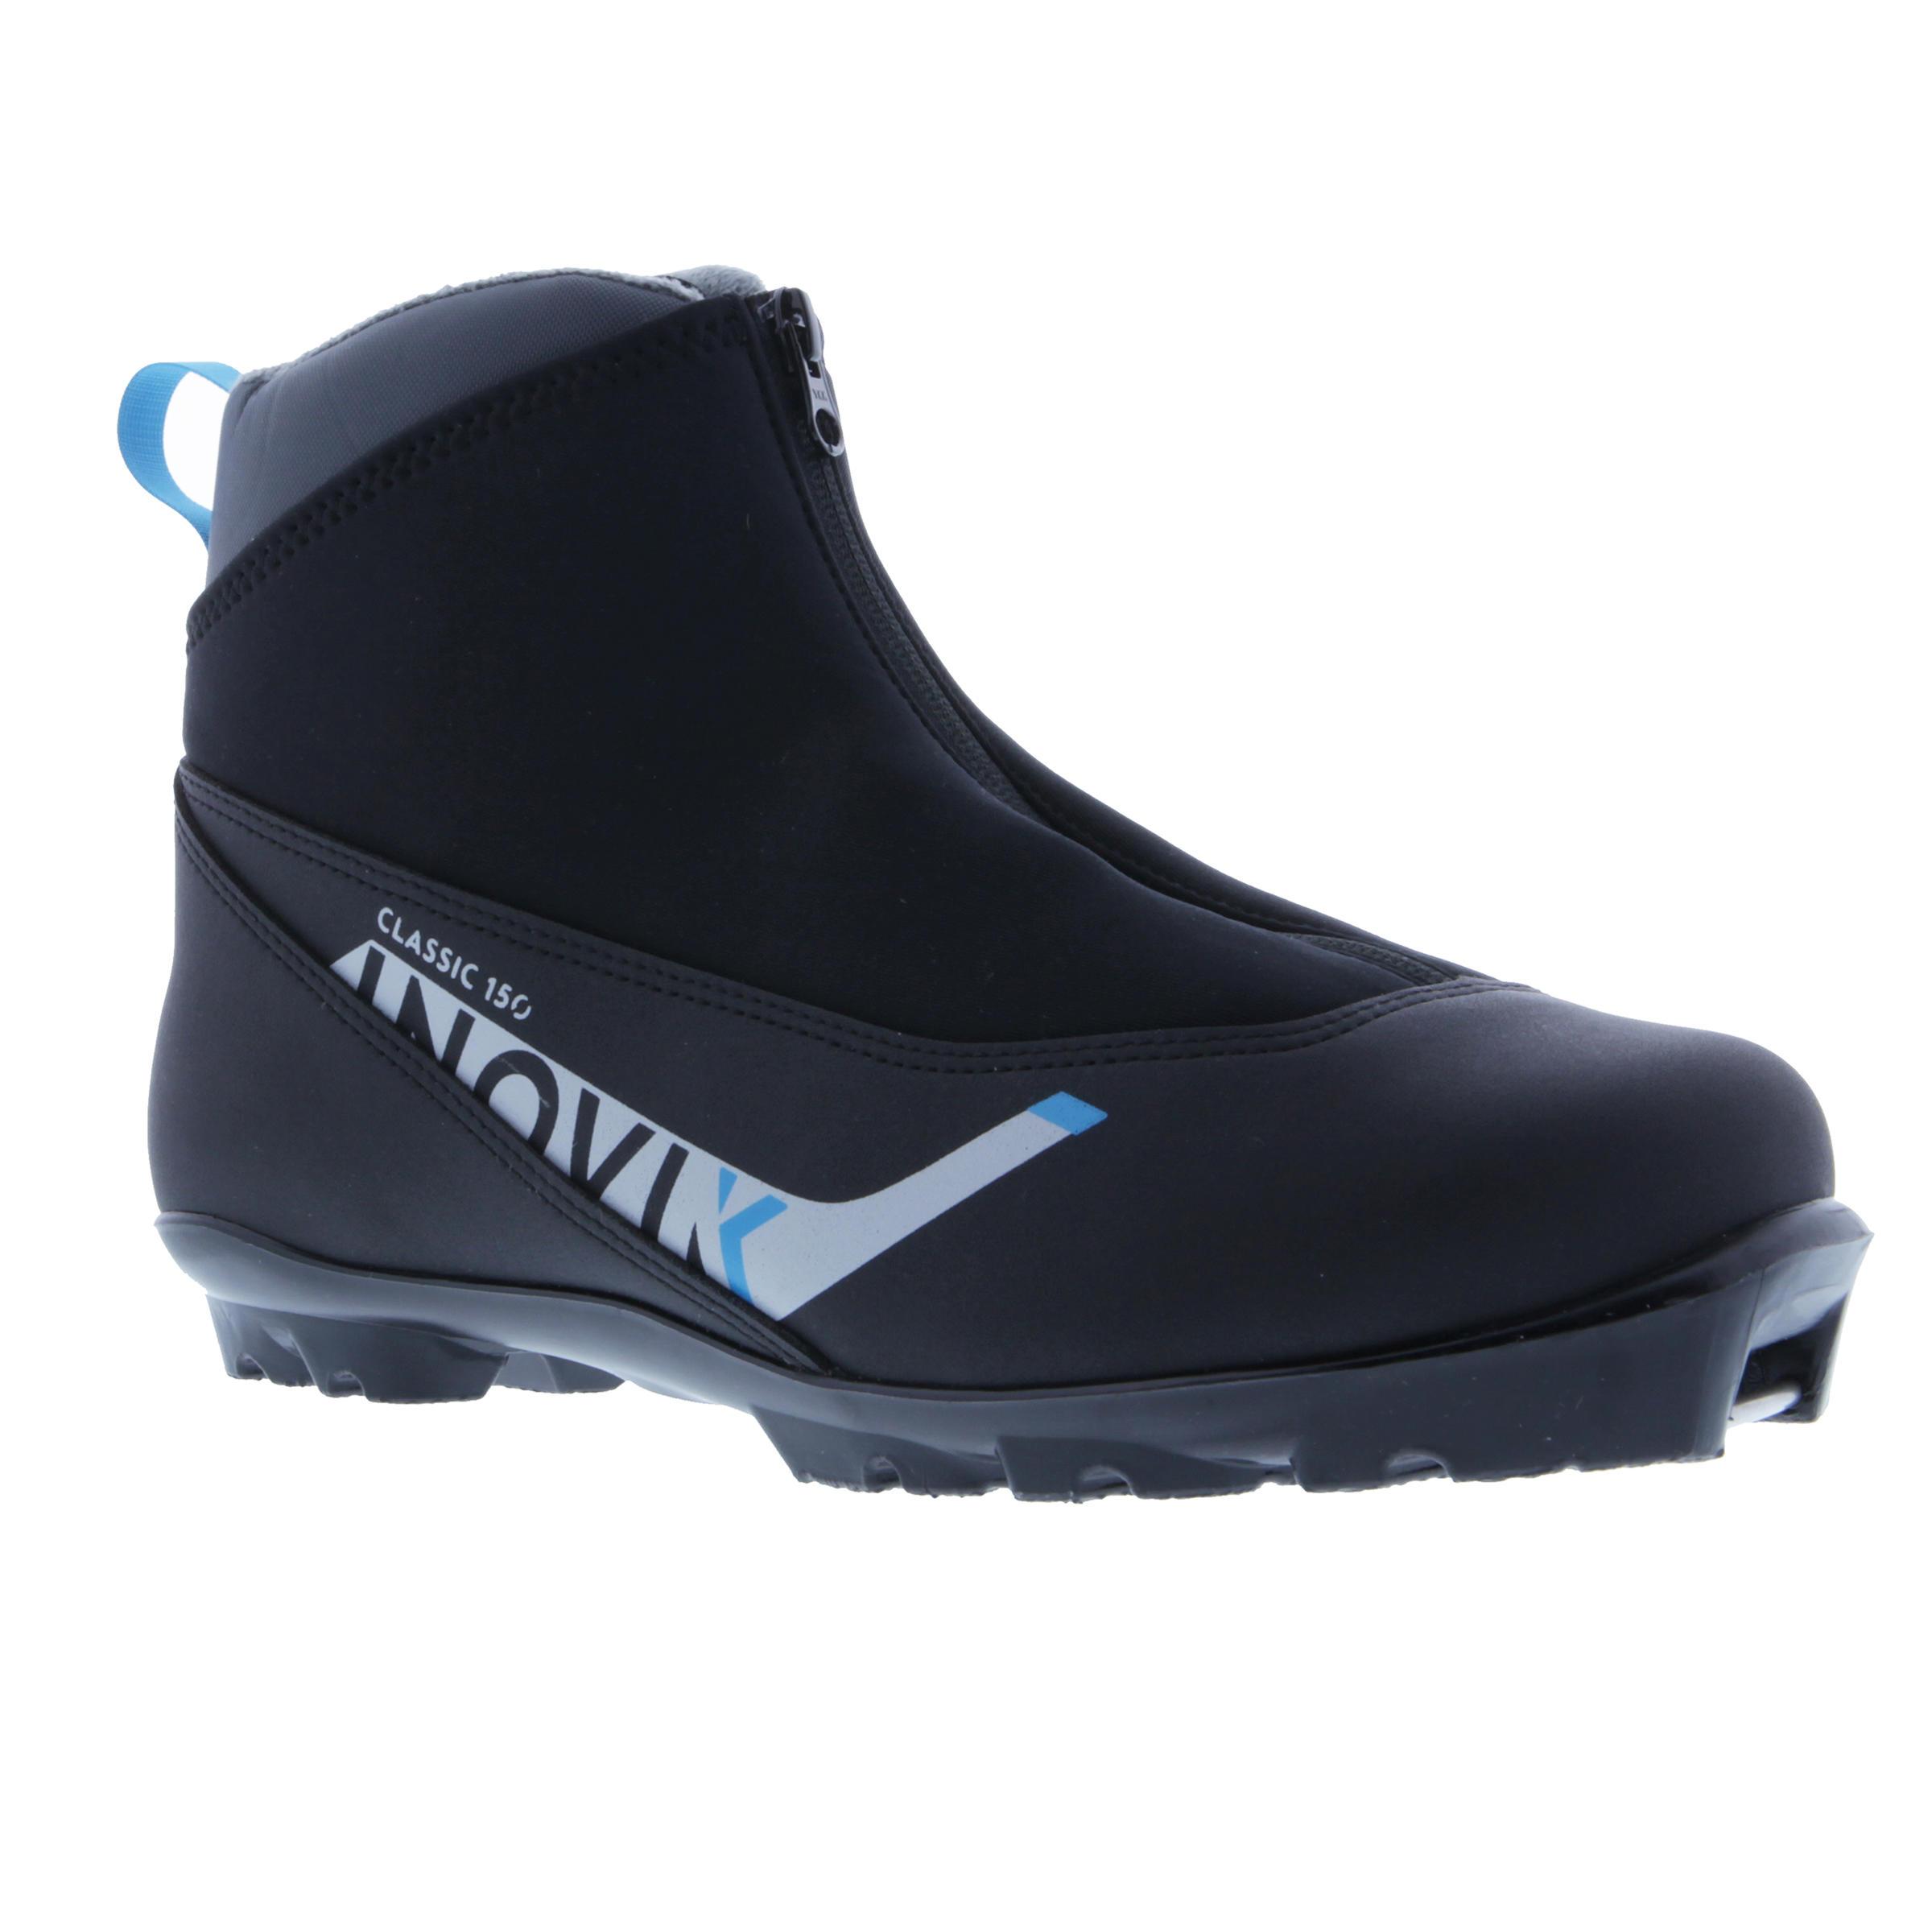 Langlaufschuhe Classic XC S Boots 150 Erwachsene | Schuhe > Sportschuhe > Laufschuhe | Inovik